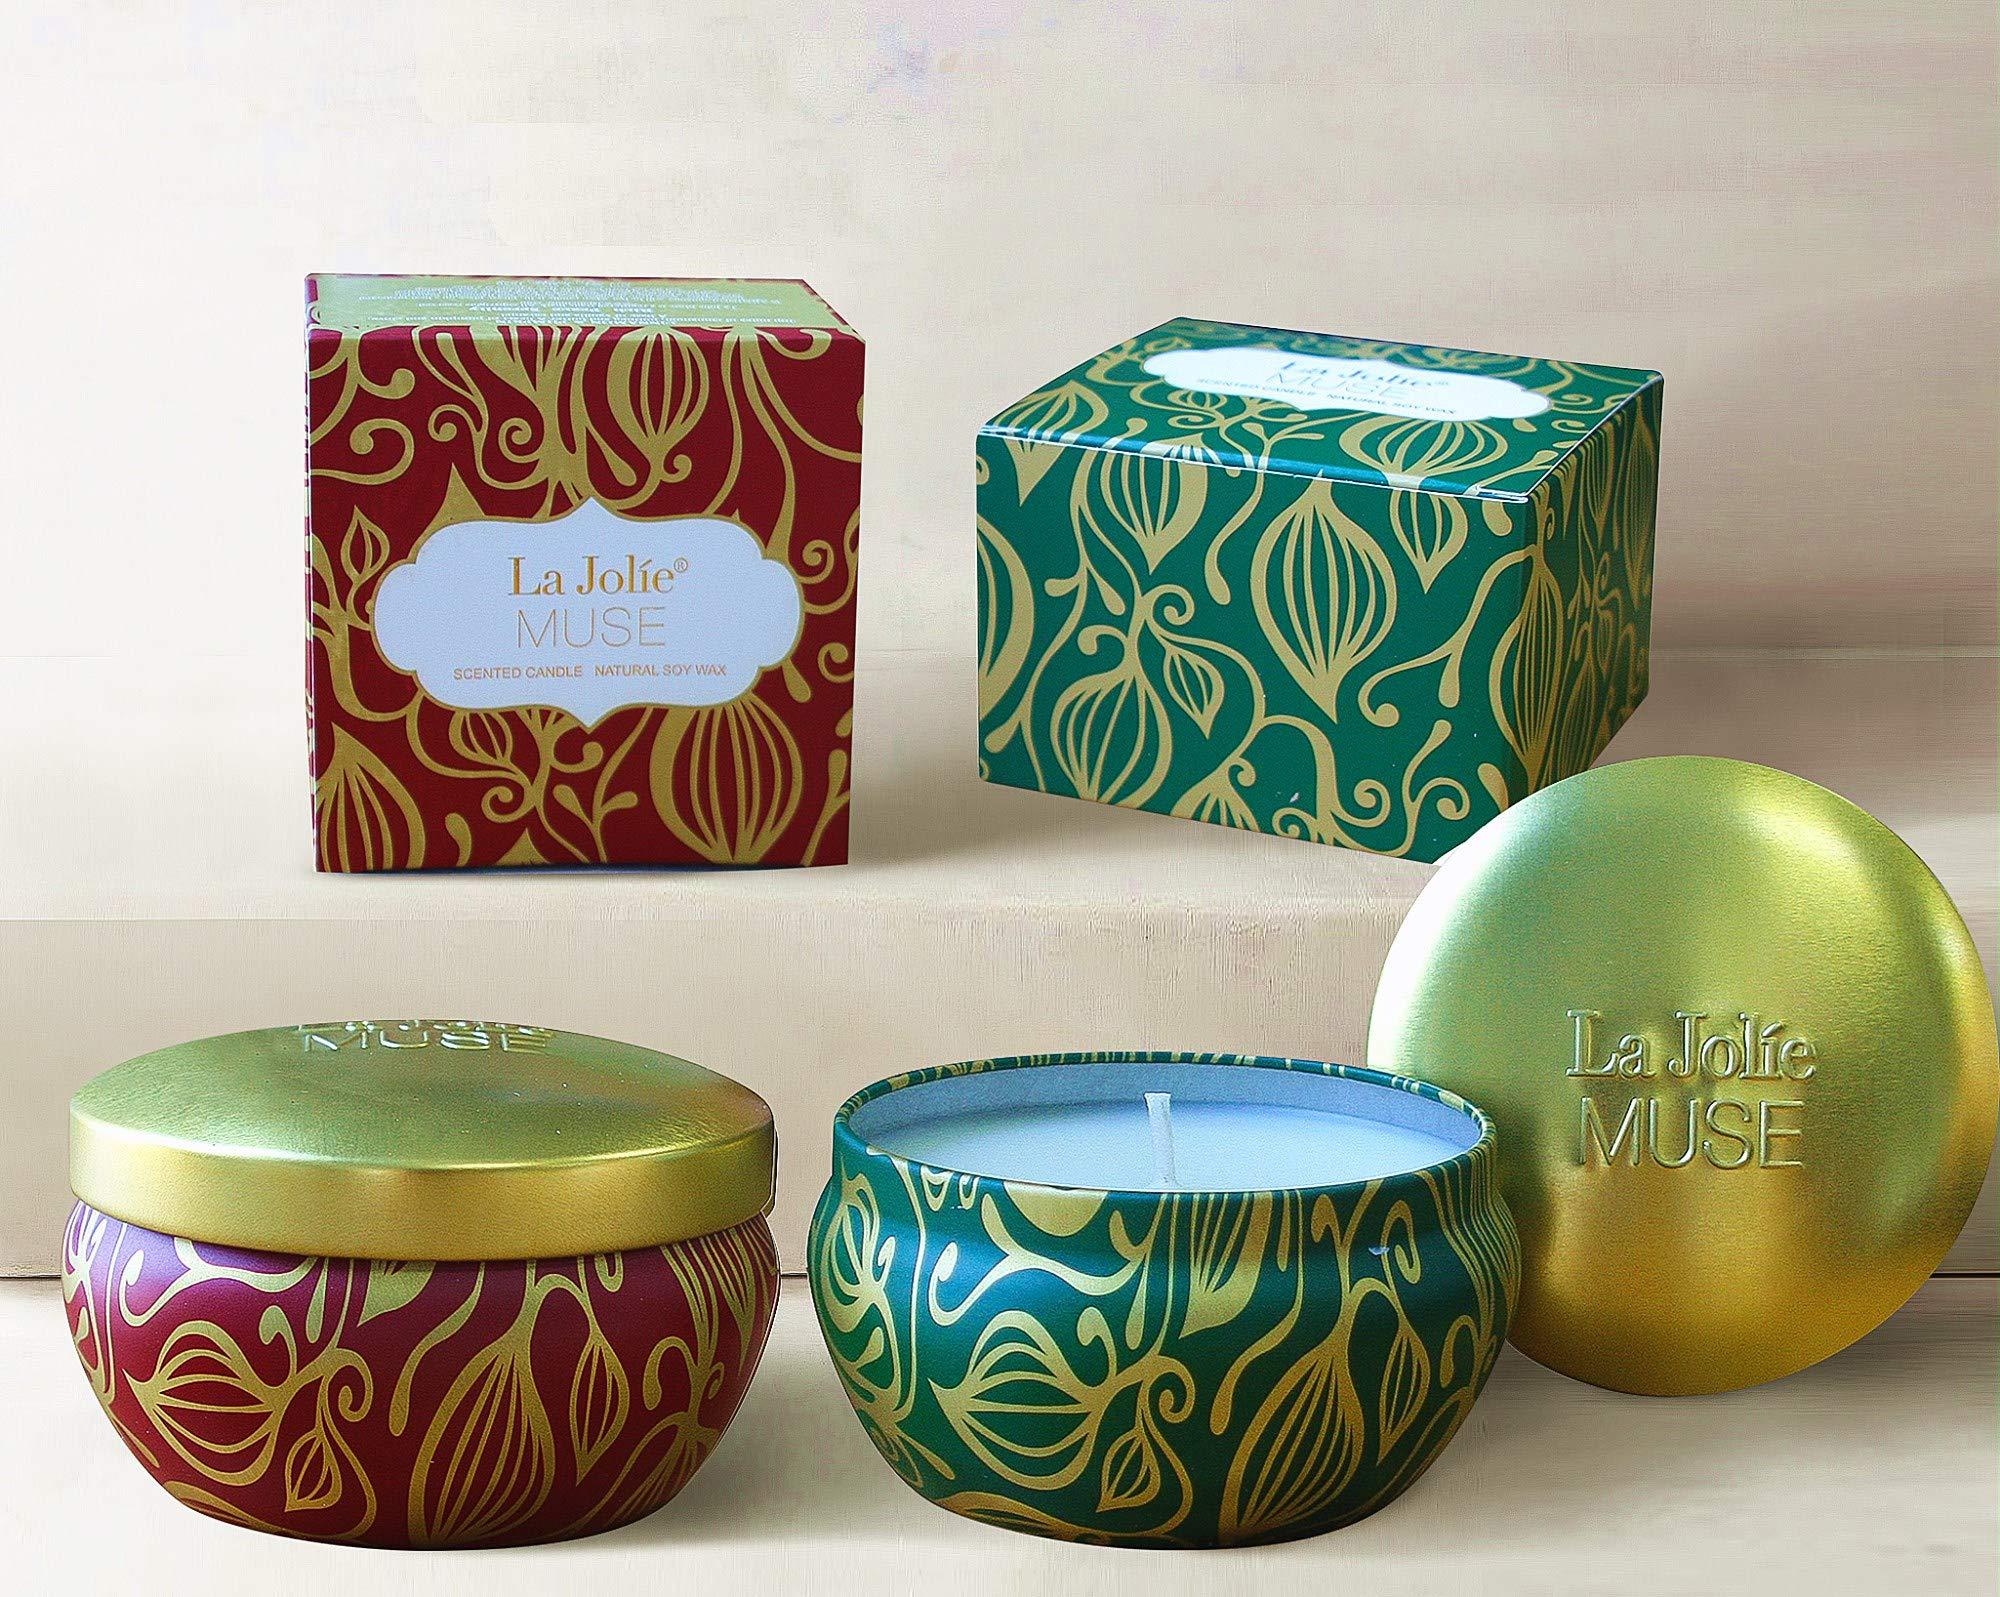 LA JOLIE MUSE Scented Candles Set 2 Cinnamon Pumpkin & Cedarwood Fir, Natural Soy Wax, Fall Winter Gift Collection